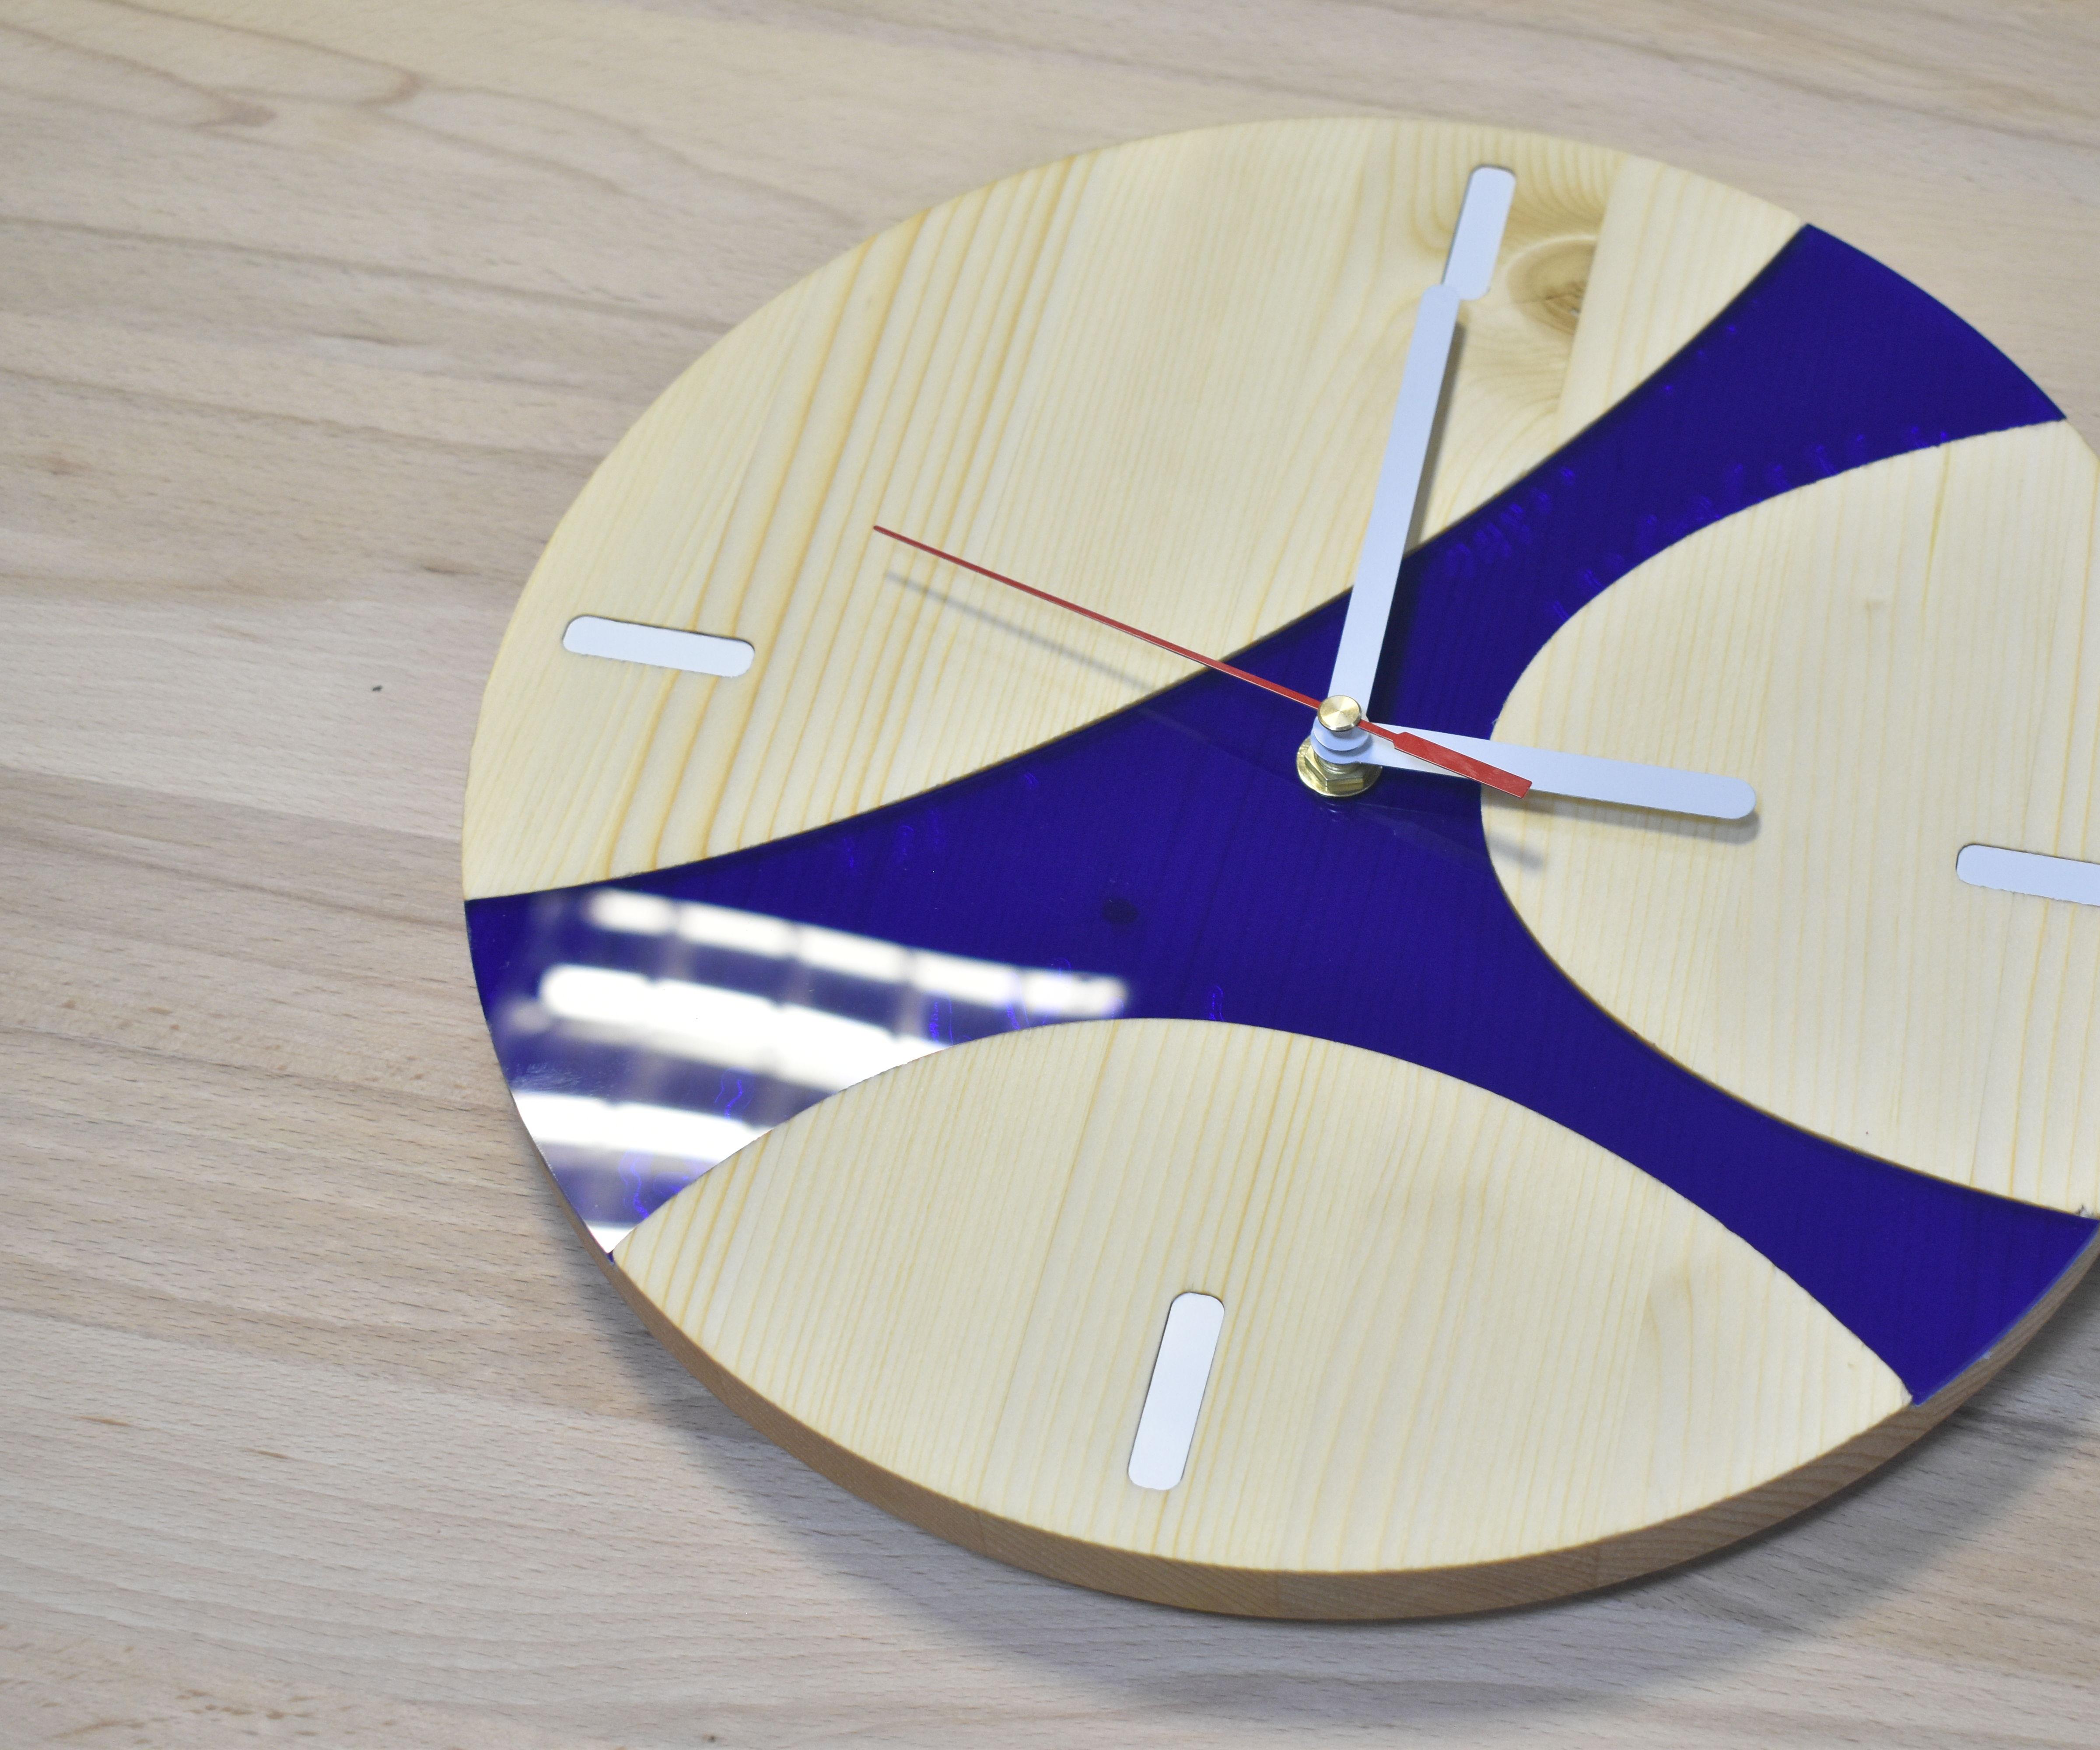 DIY Wood/Acrylic Clock